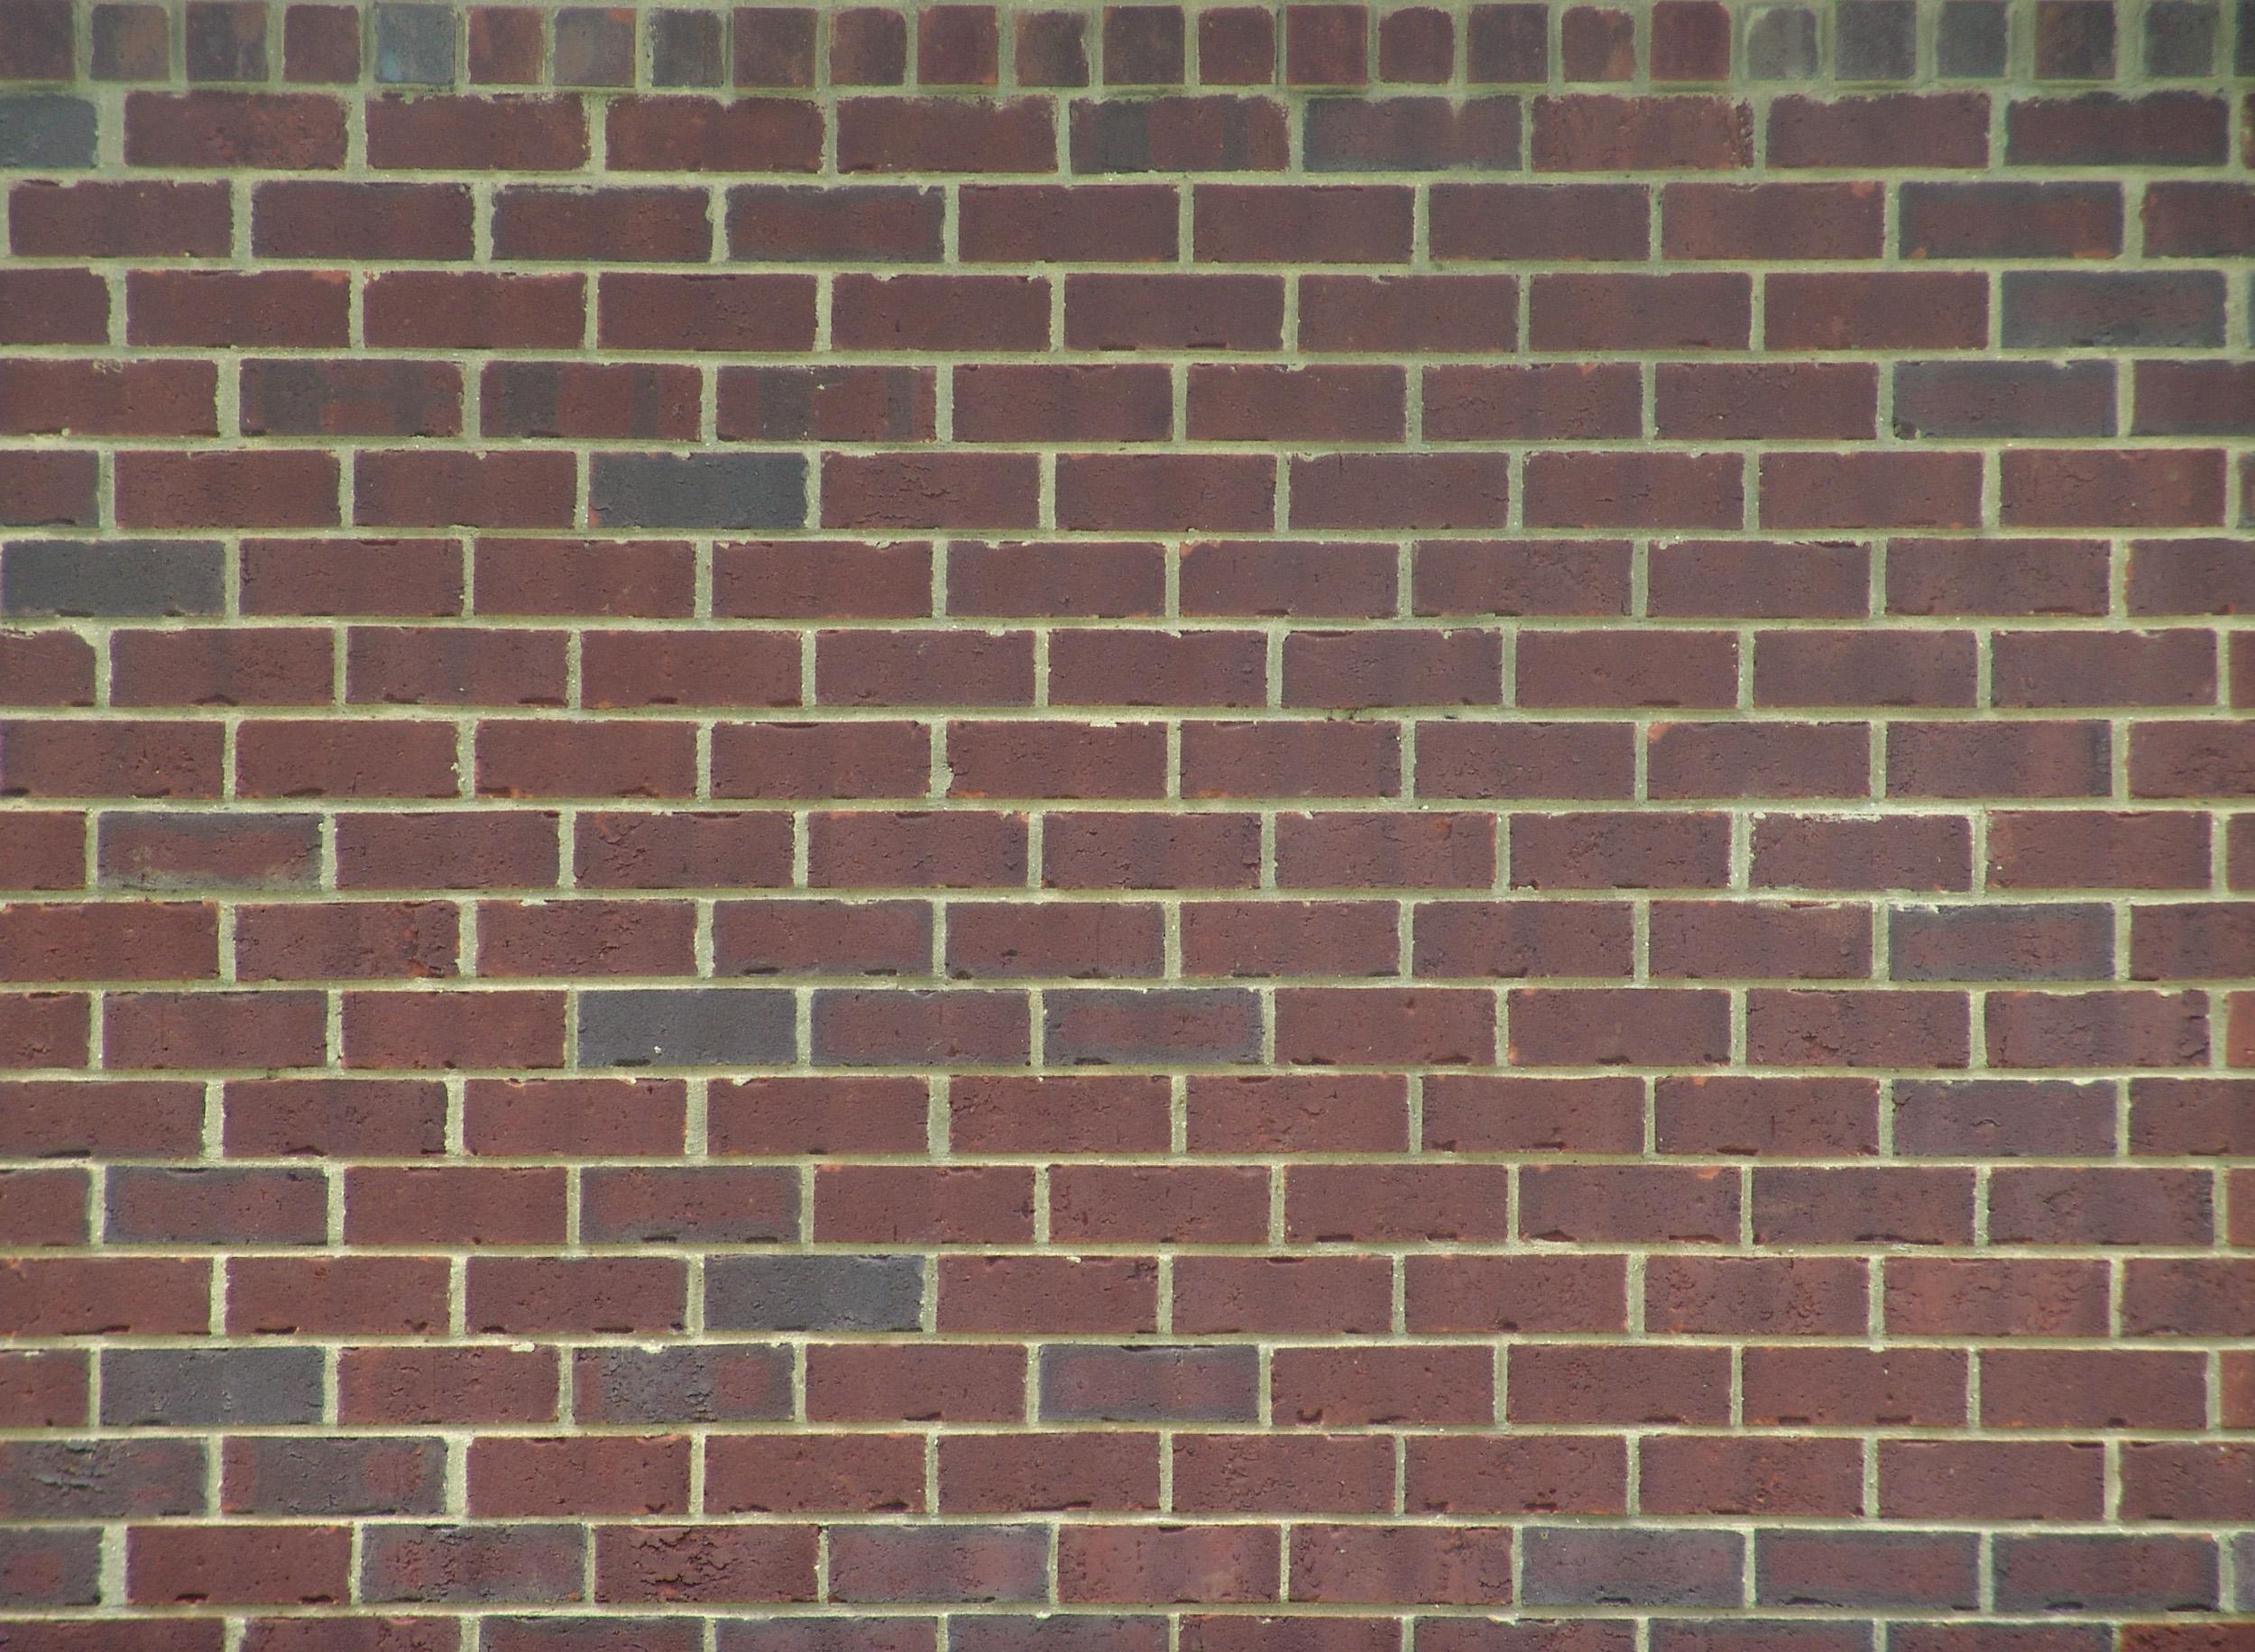 brick wall Texture, download photo, image, bricks, brick masonry, bricks wall background texture